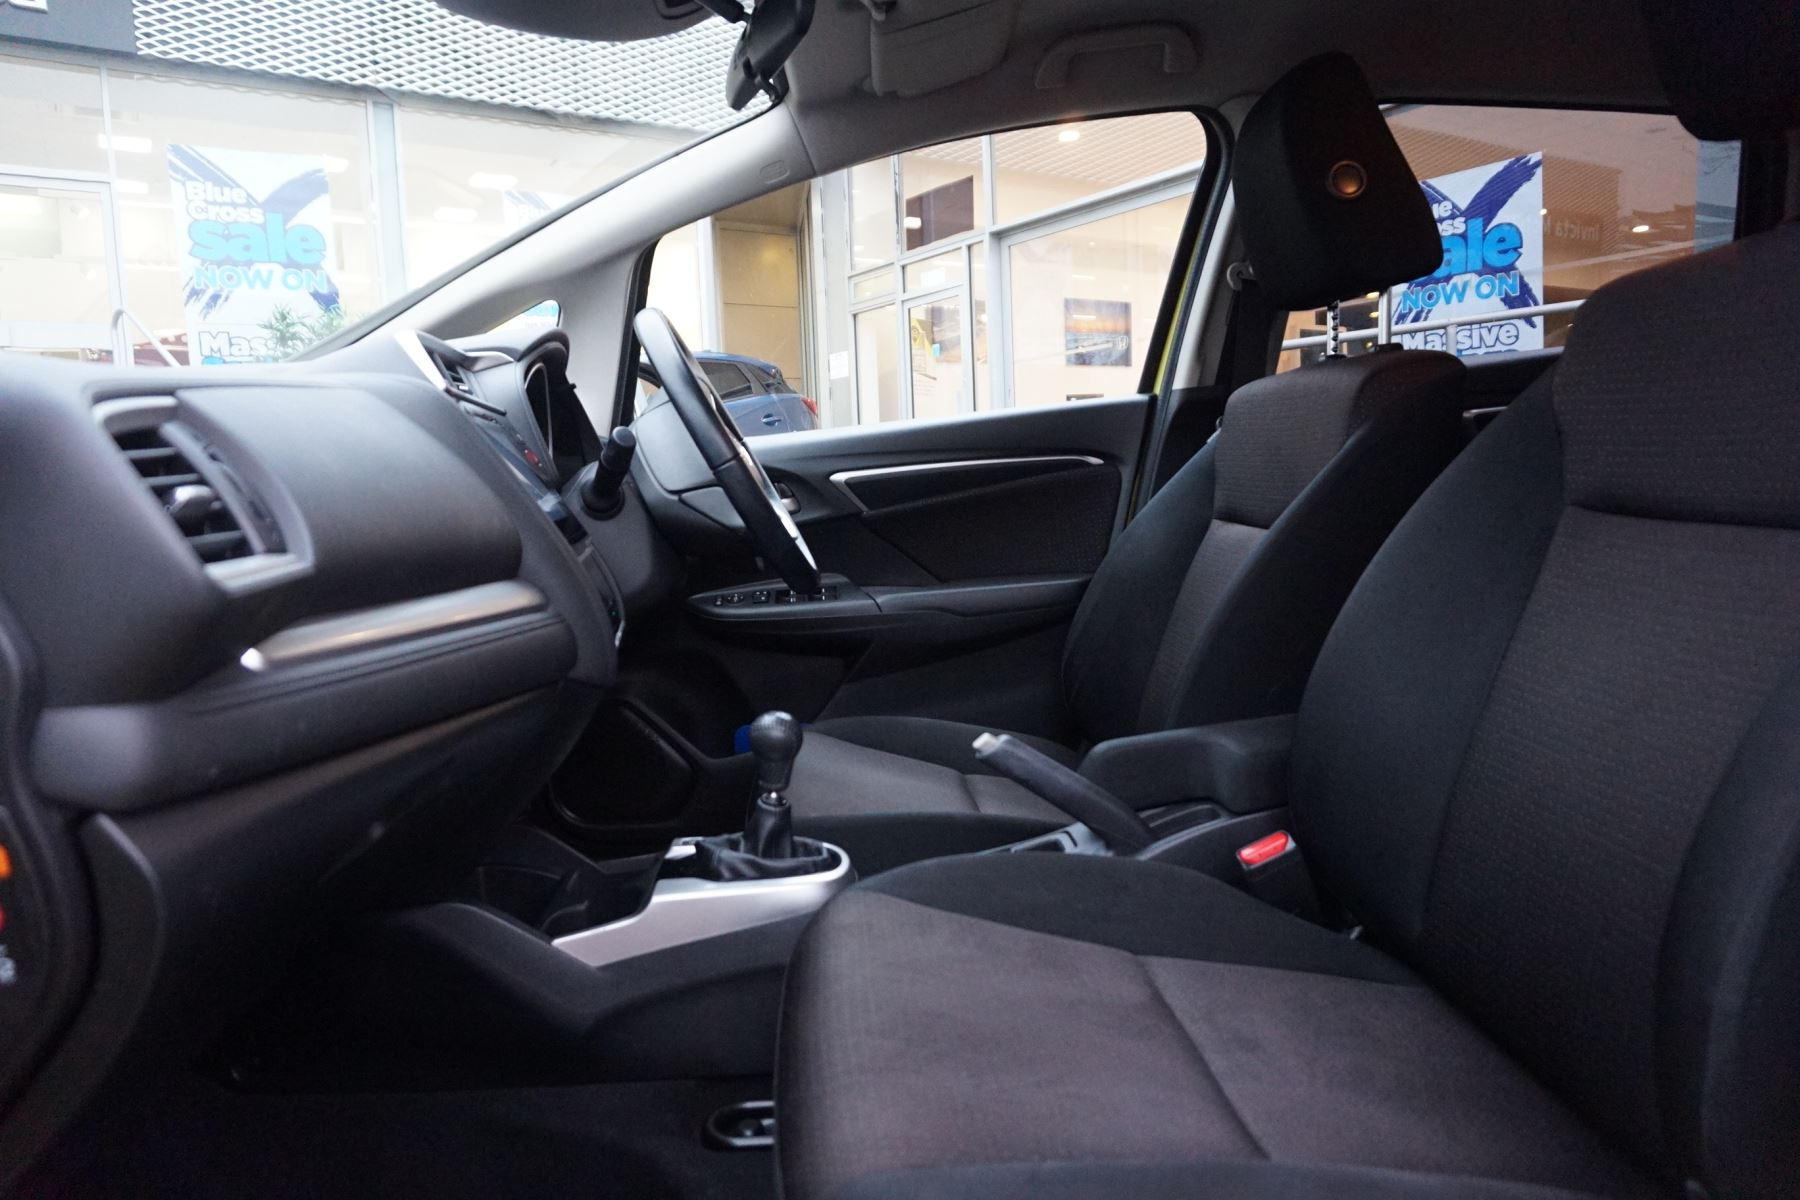 Honda Jazz 1.3 EX 5dr image 7